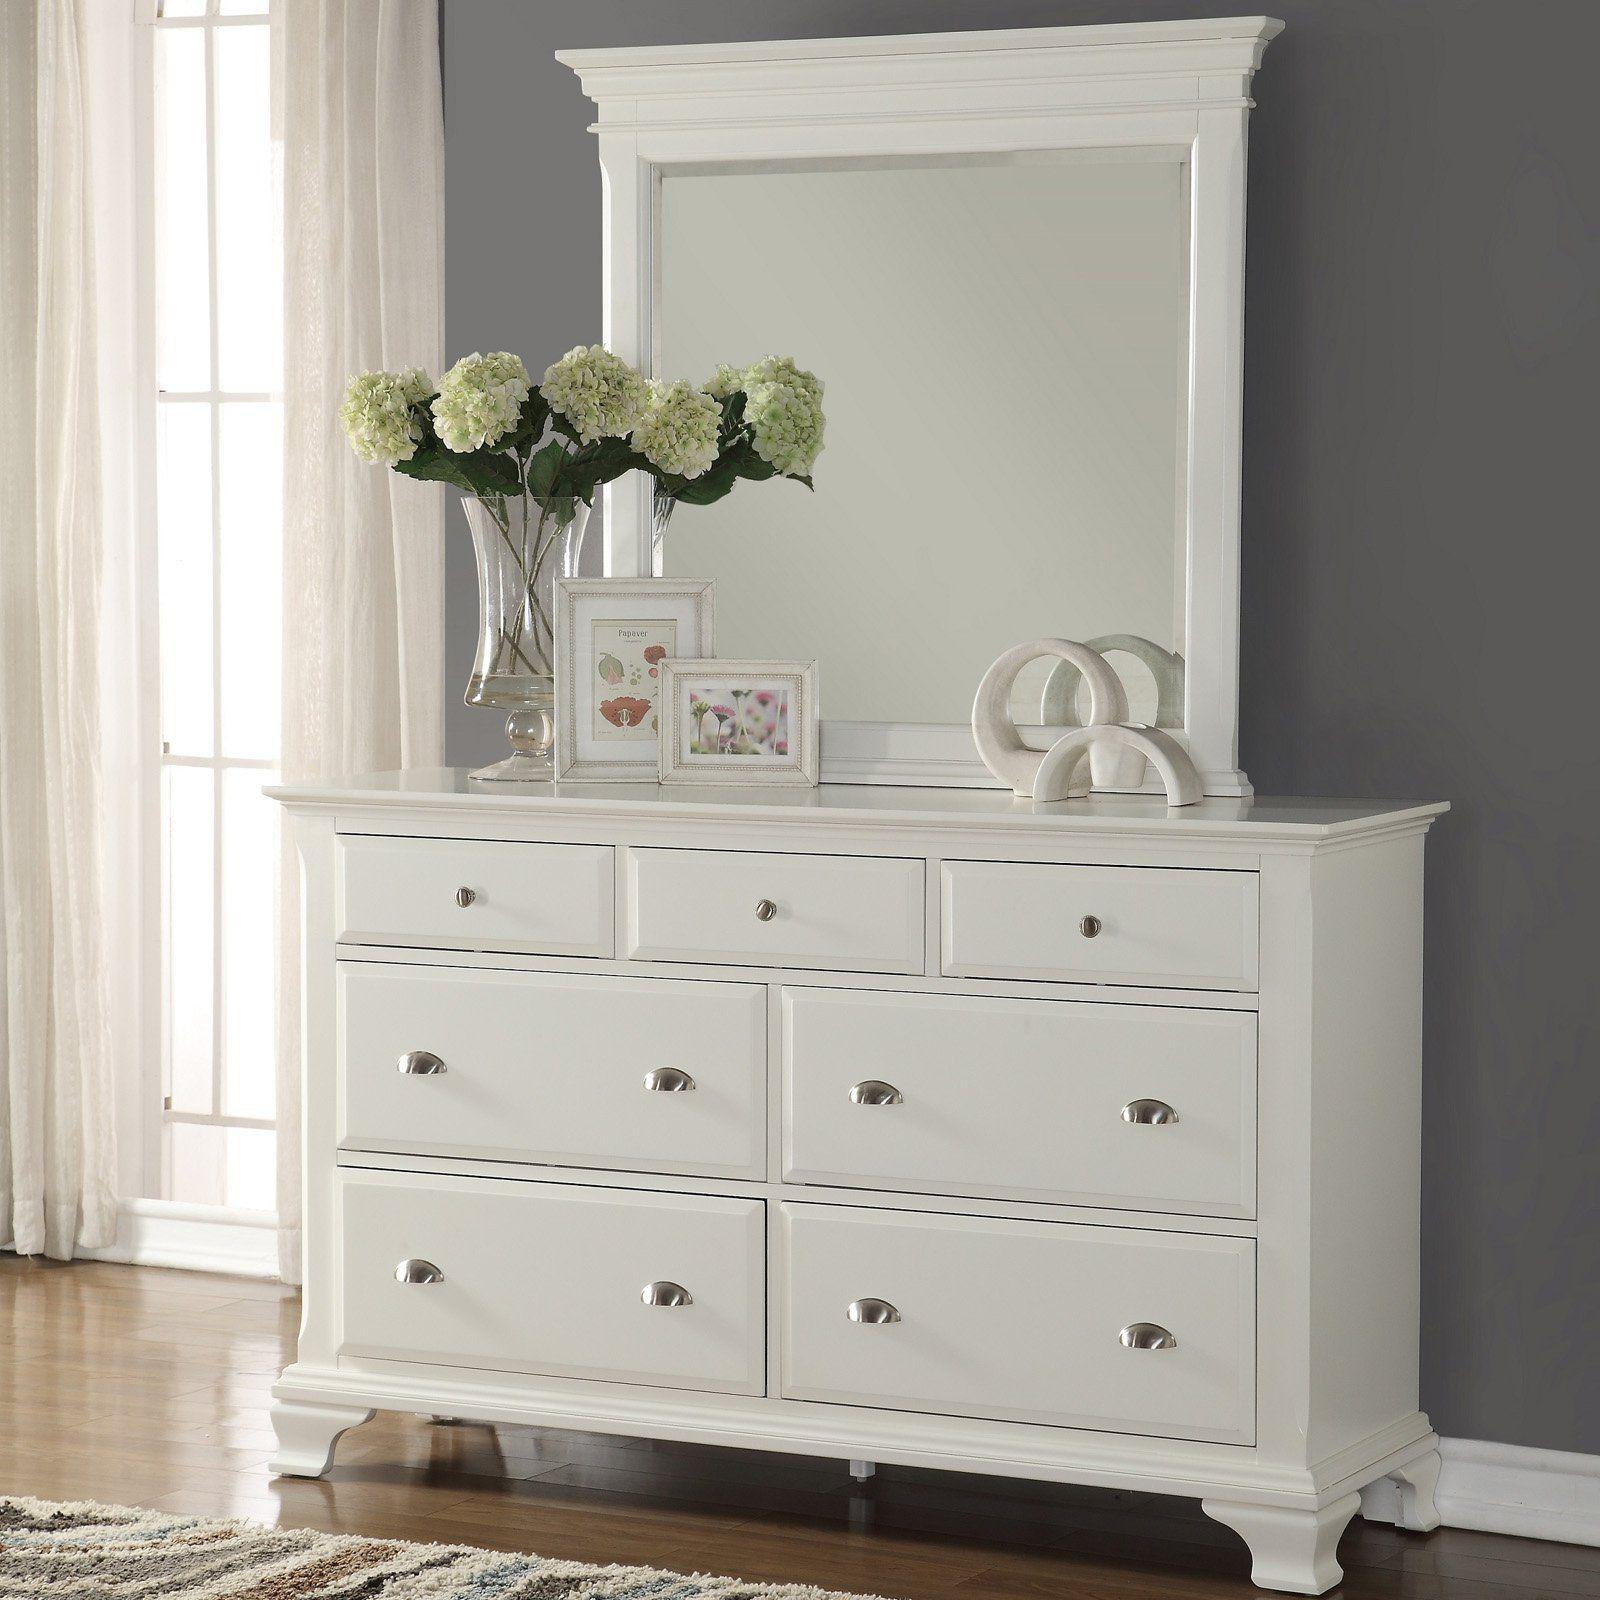 Roundhill Furniture Laveno White Wood 7 Drawer Dresser